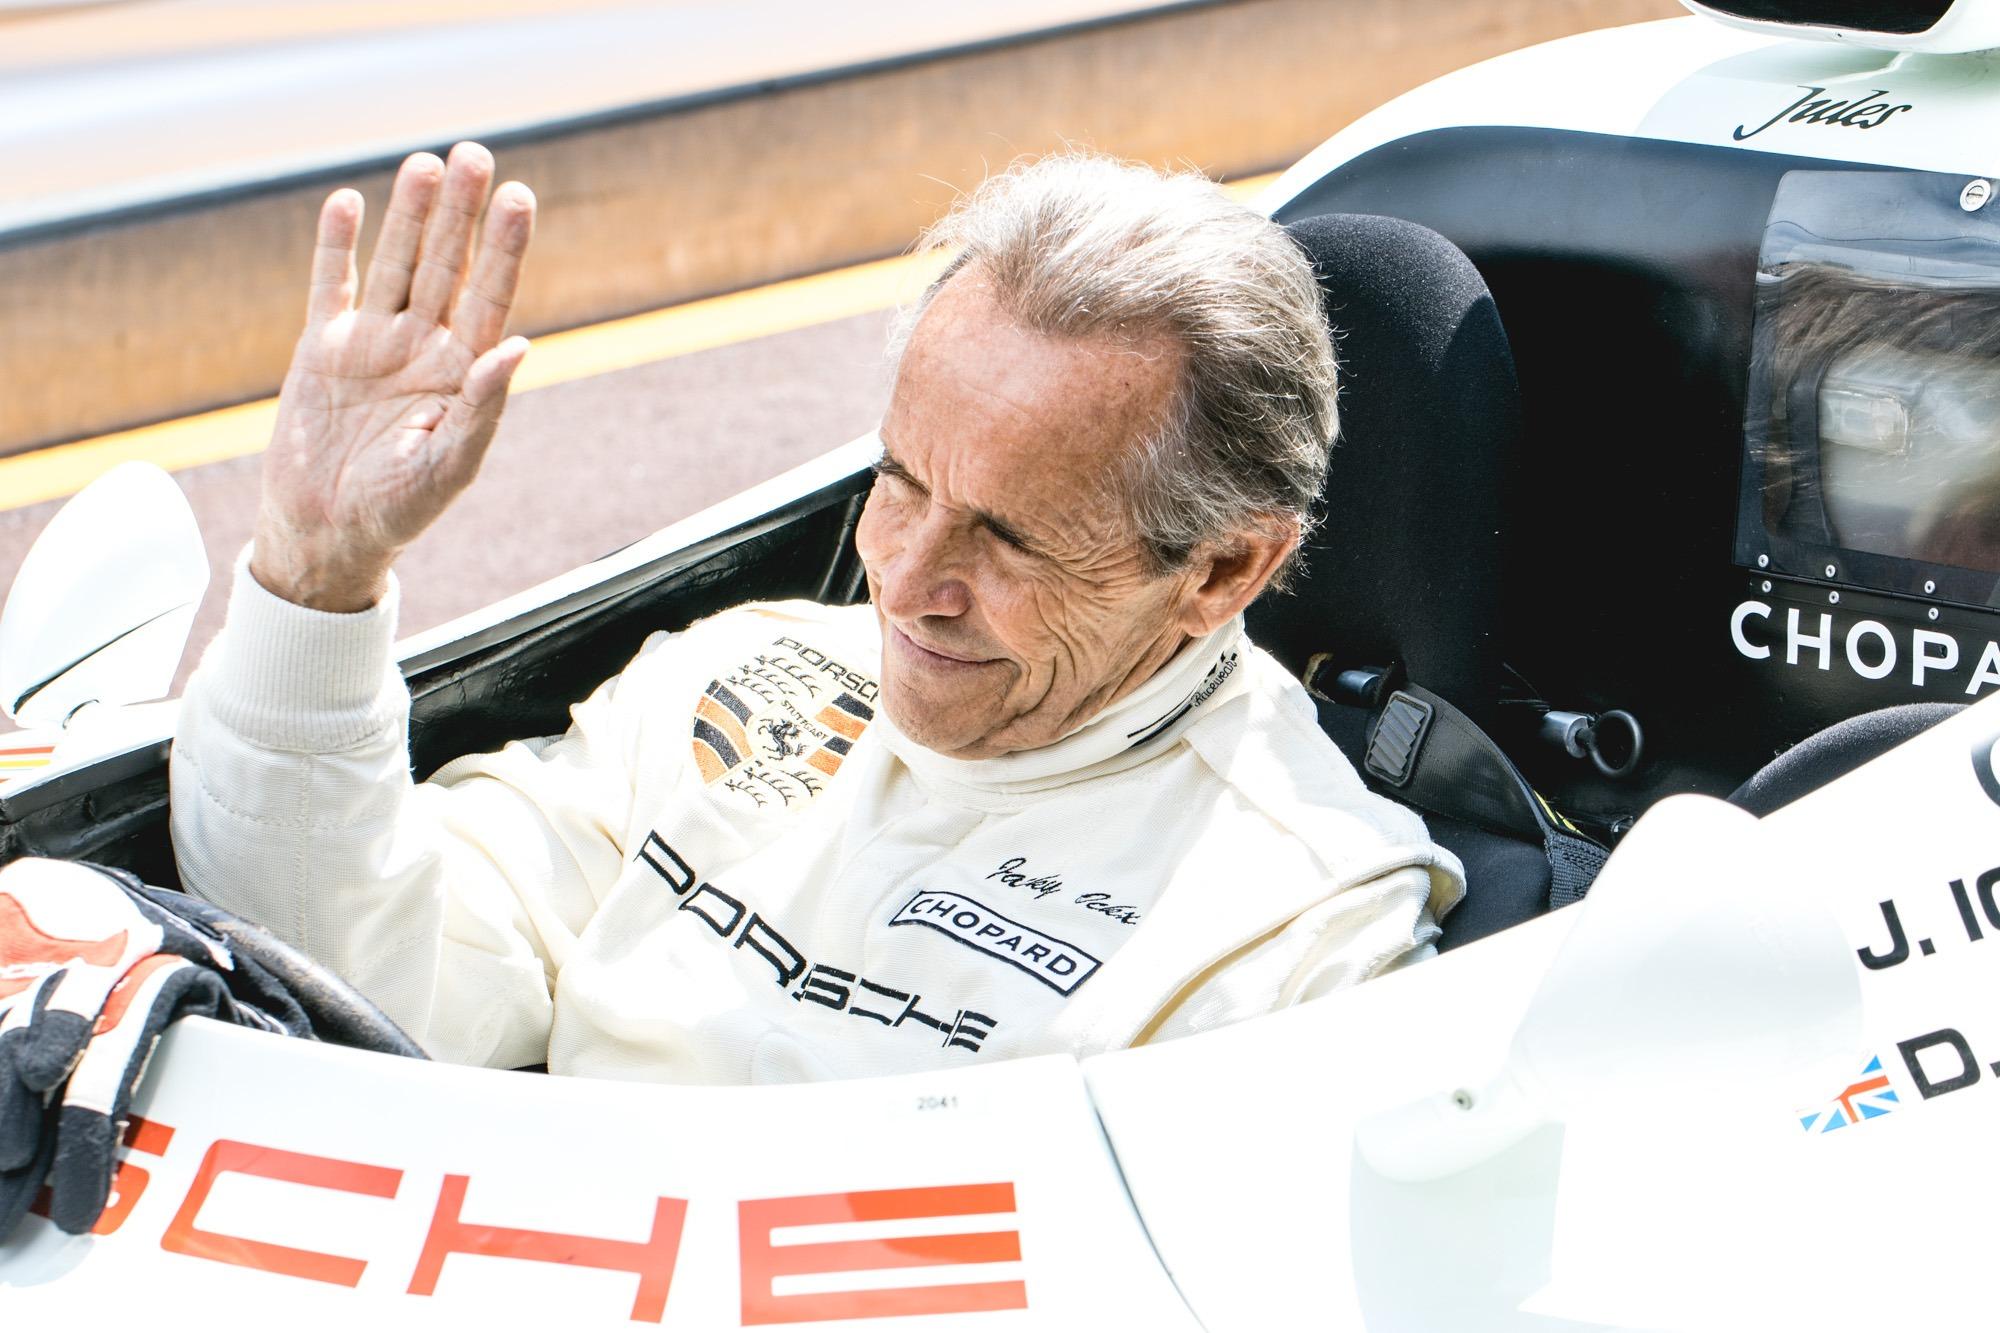 Grand Prix de Monaco Historique - Jacky Ickx